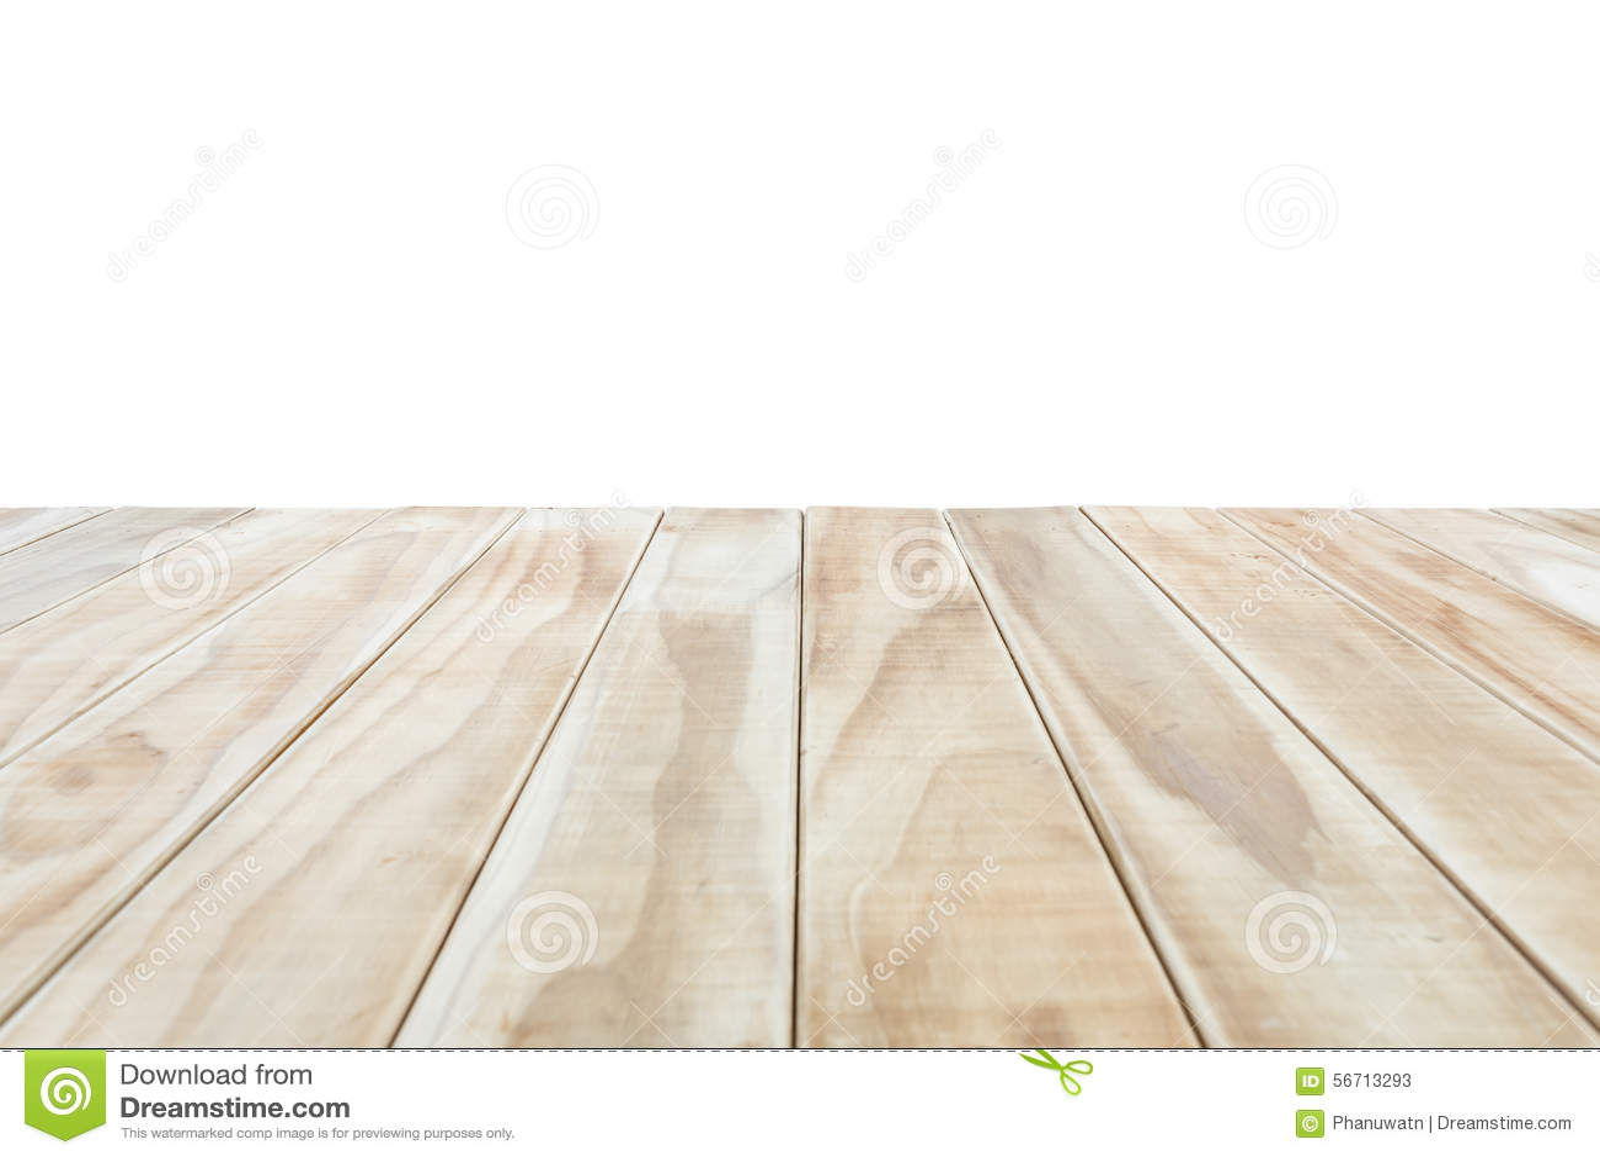 Parte superior vazia da tabela ou do contador de madeira isolada no backgroun branco